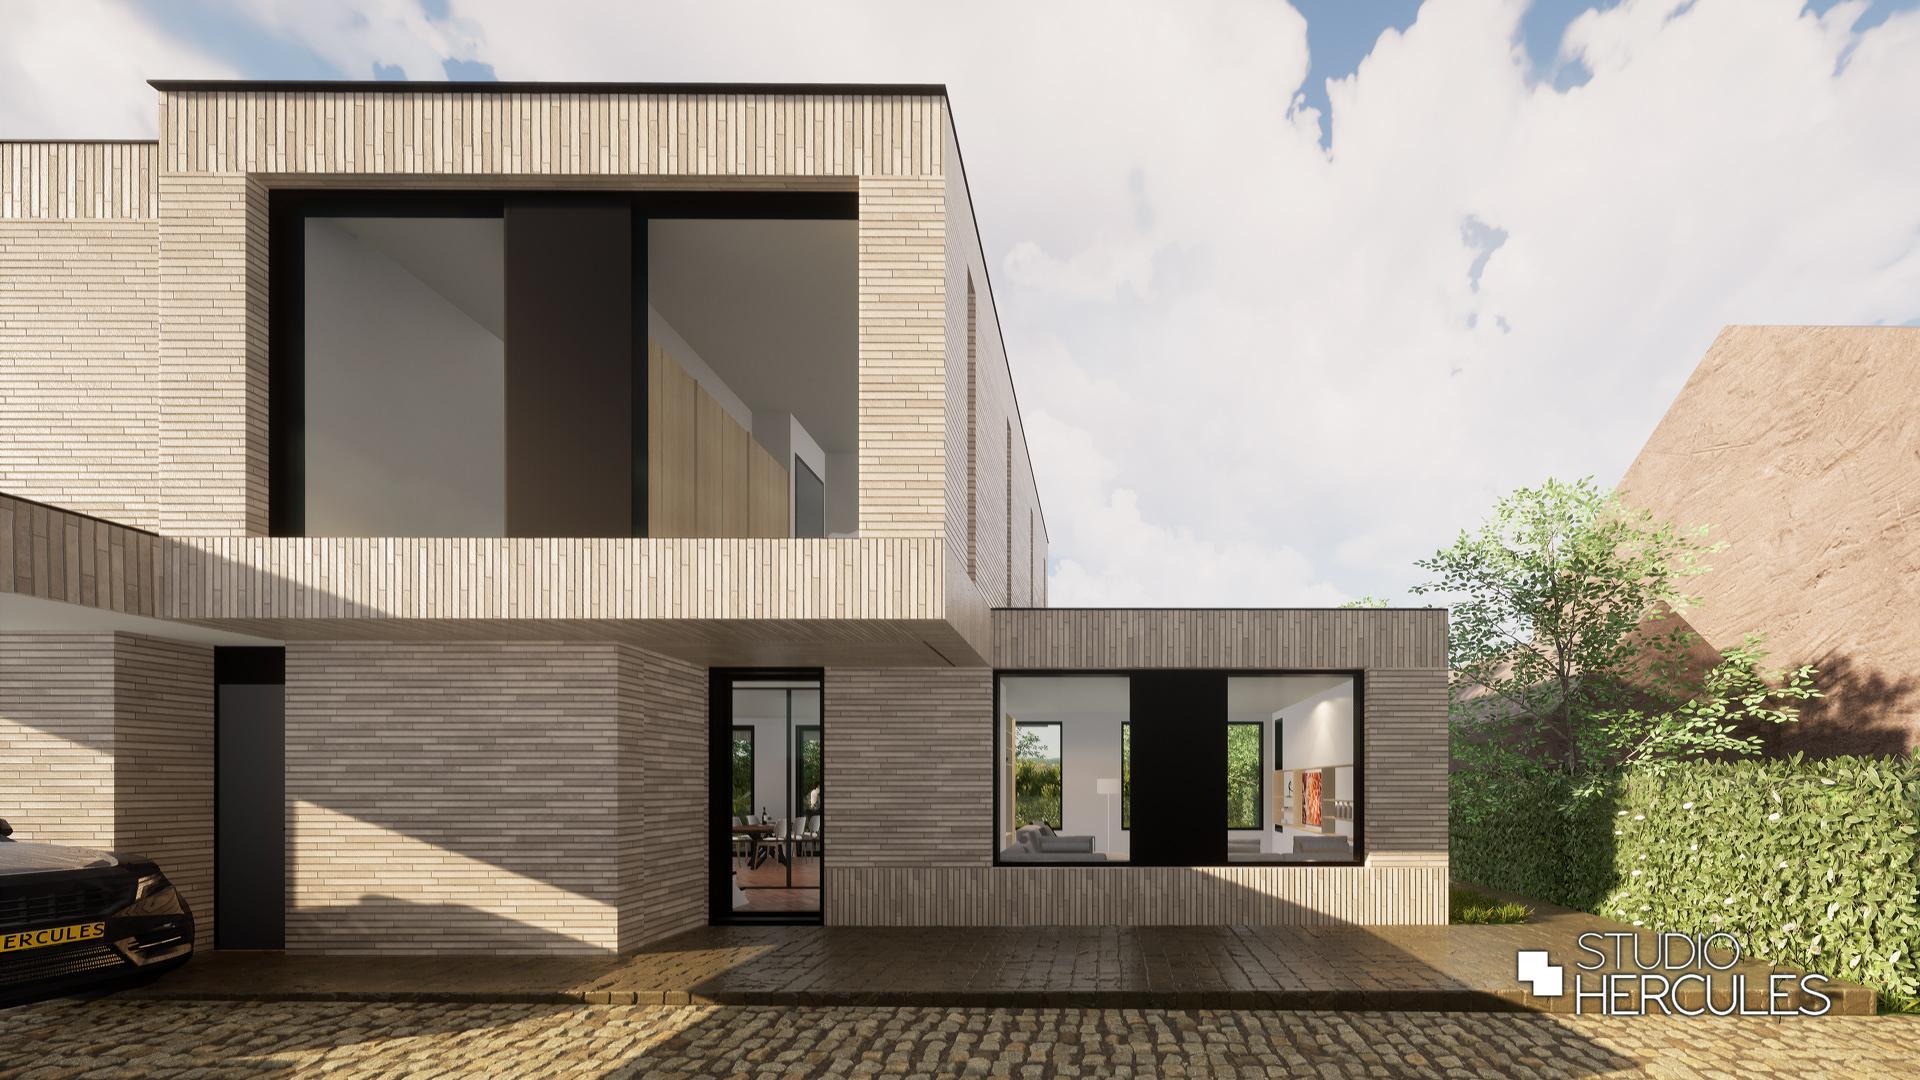 Exclusief ontwerp van moderne architect